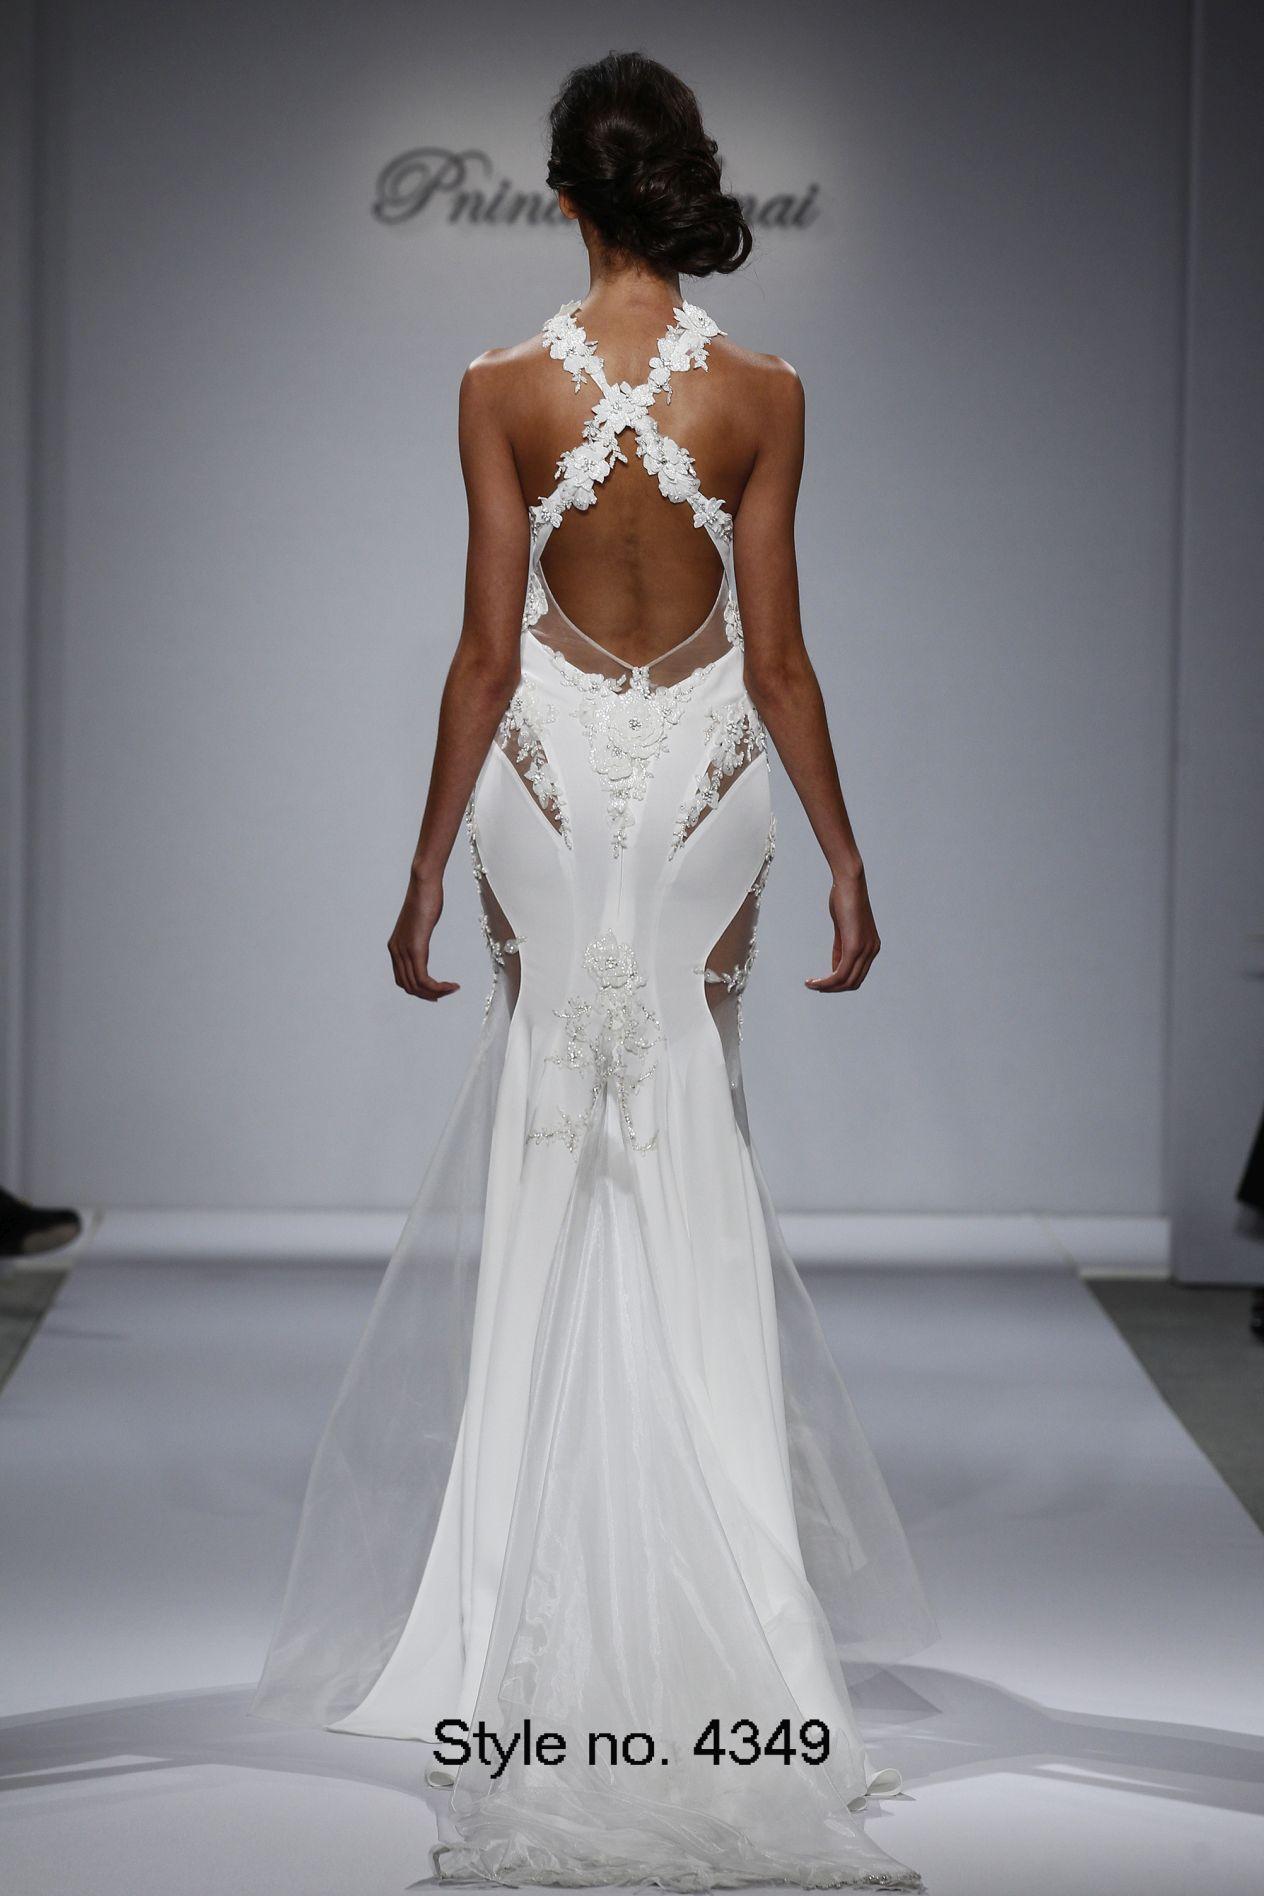 Pnina Tornai 2015 Mermaid Wedding Dresses Beads Flowers